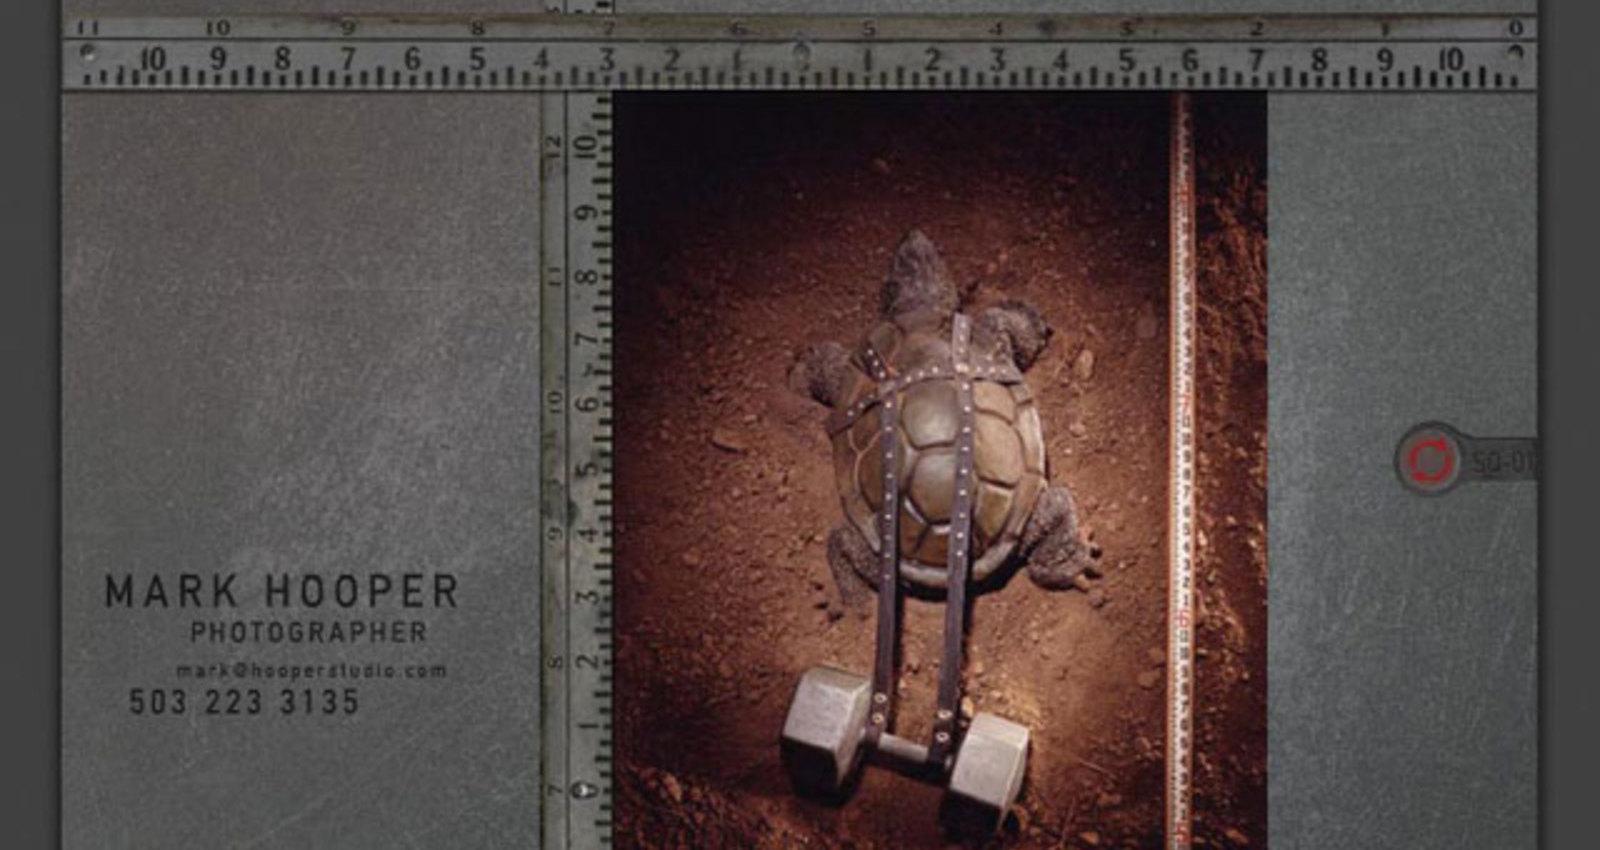 Mark Hooper Photographer Web Site